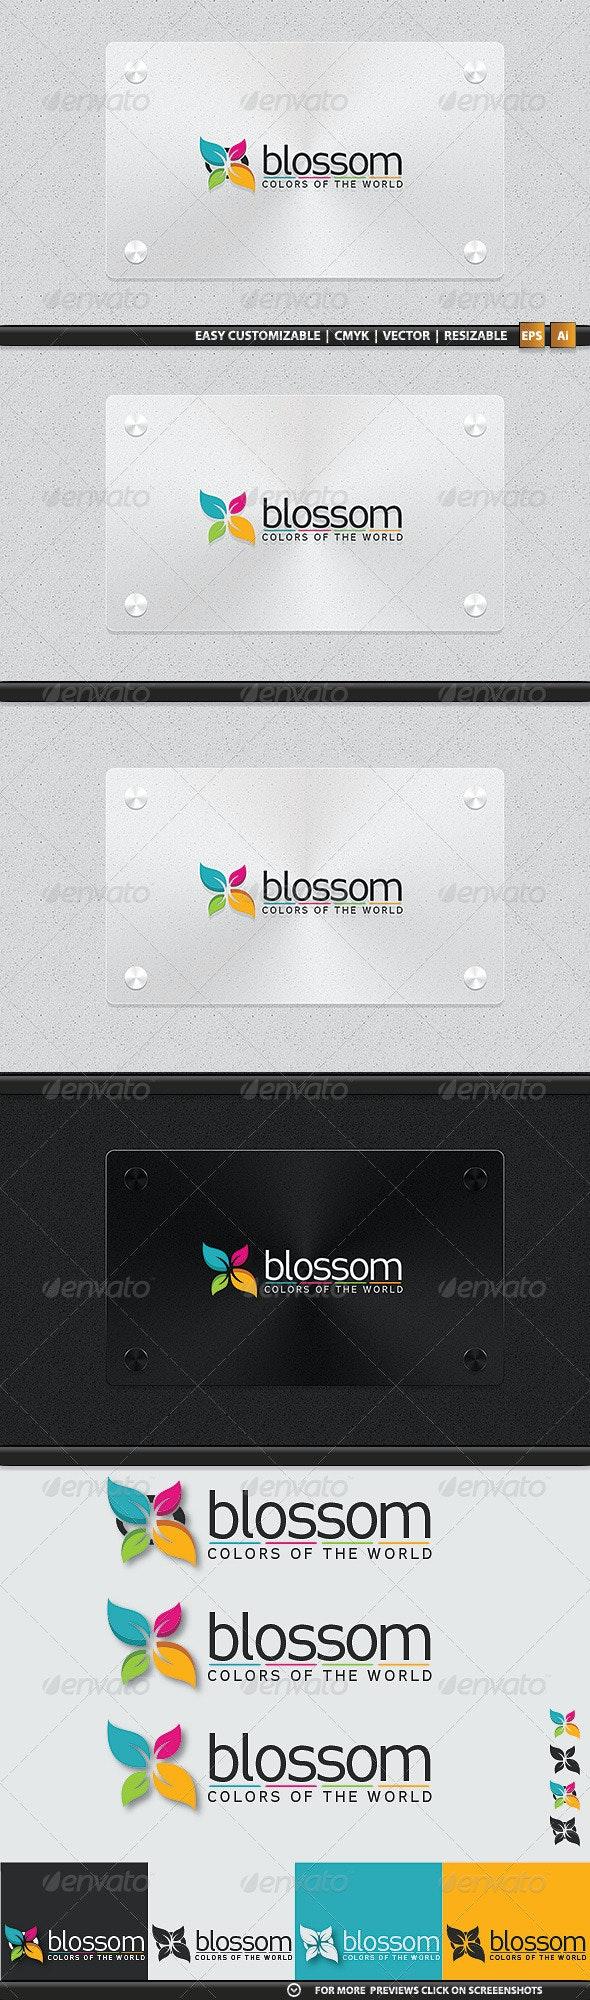 3 Variations Blossom Logotype - Nature Logo Templates